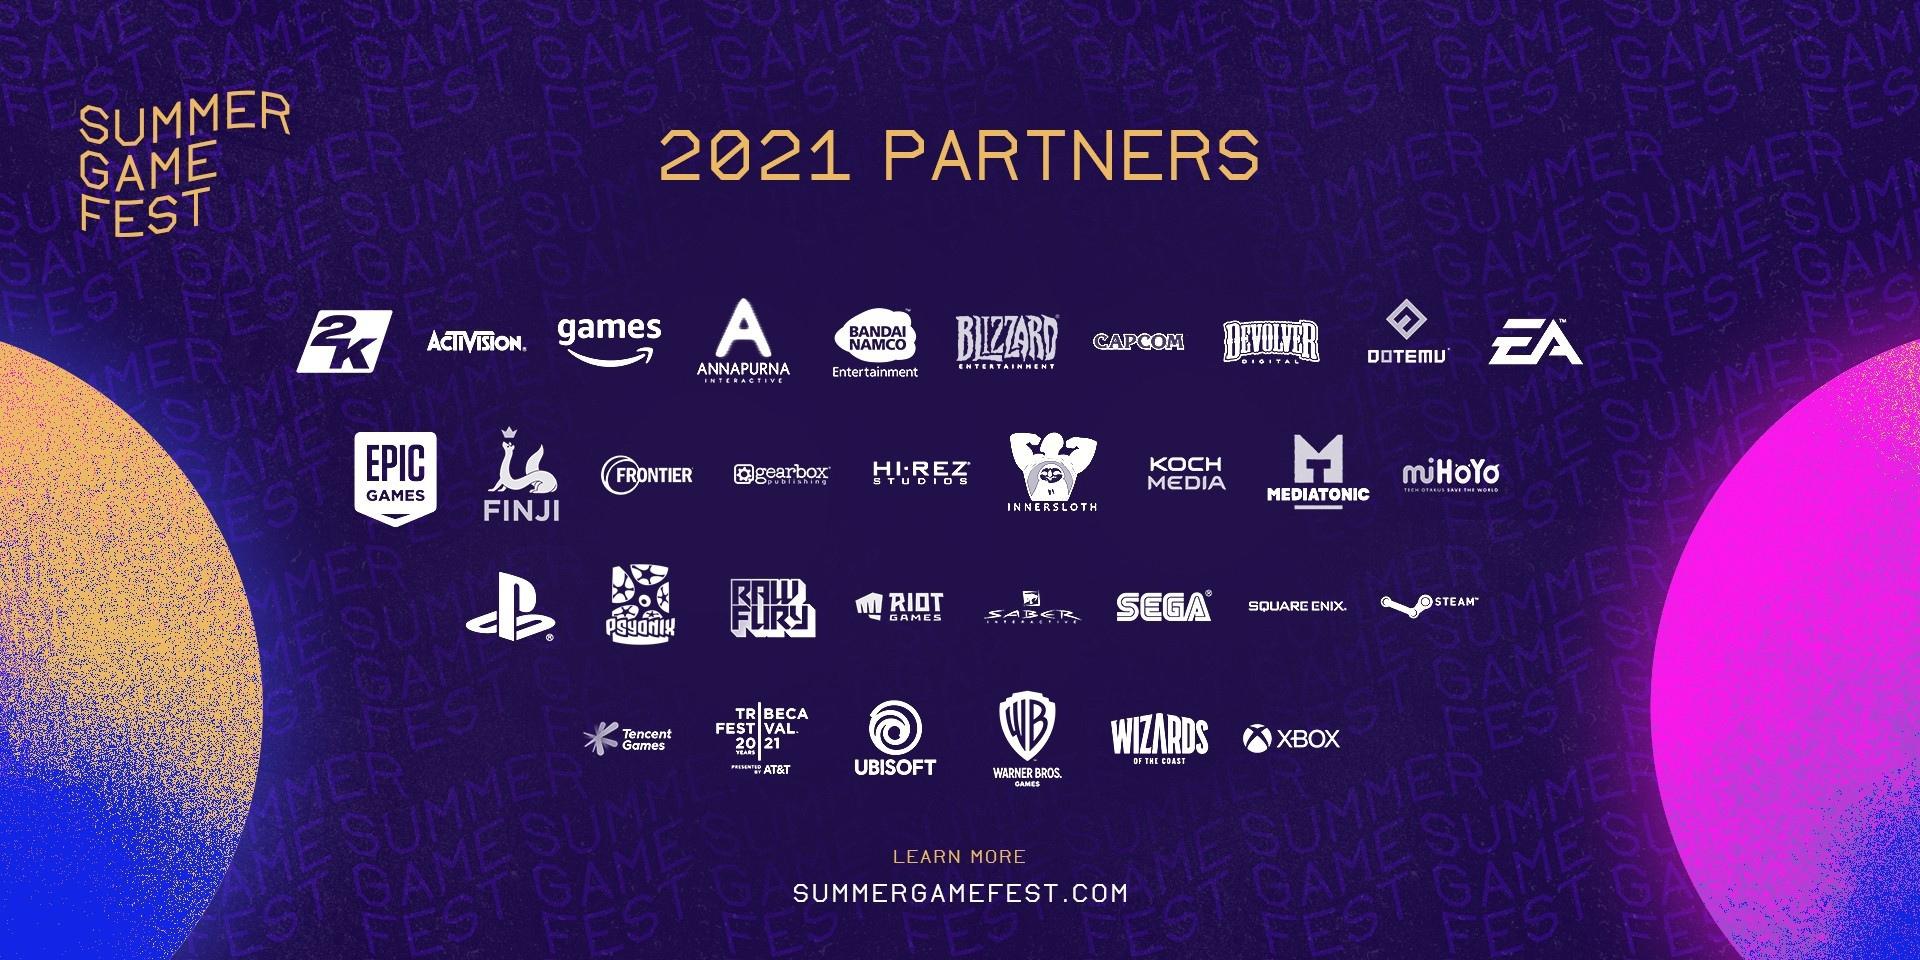 Напоминалка: сегодня в 21:00 МСК пройдет презентация Summer Game Fest